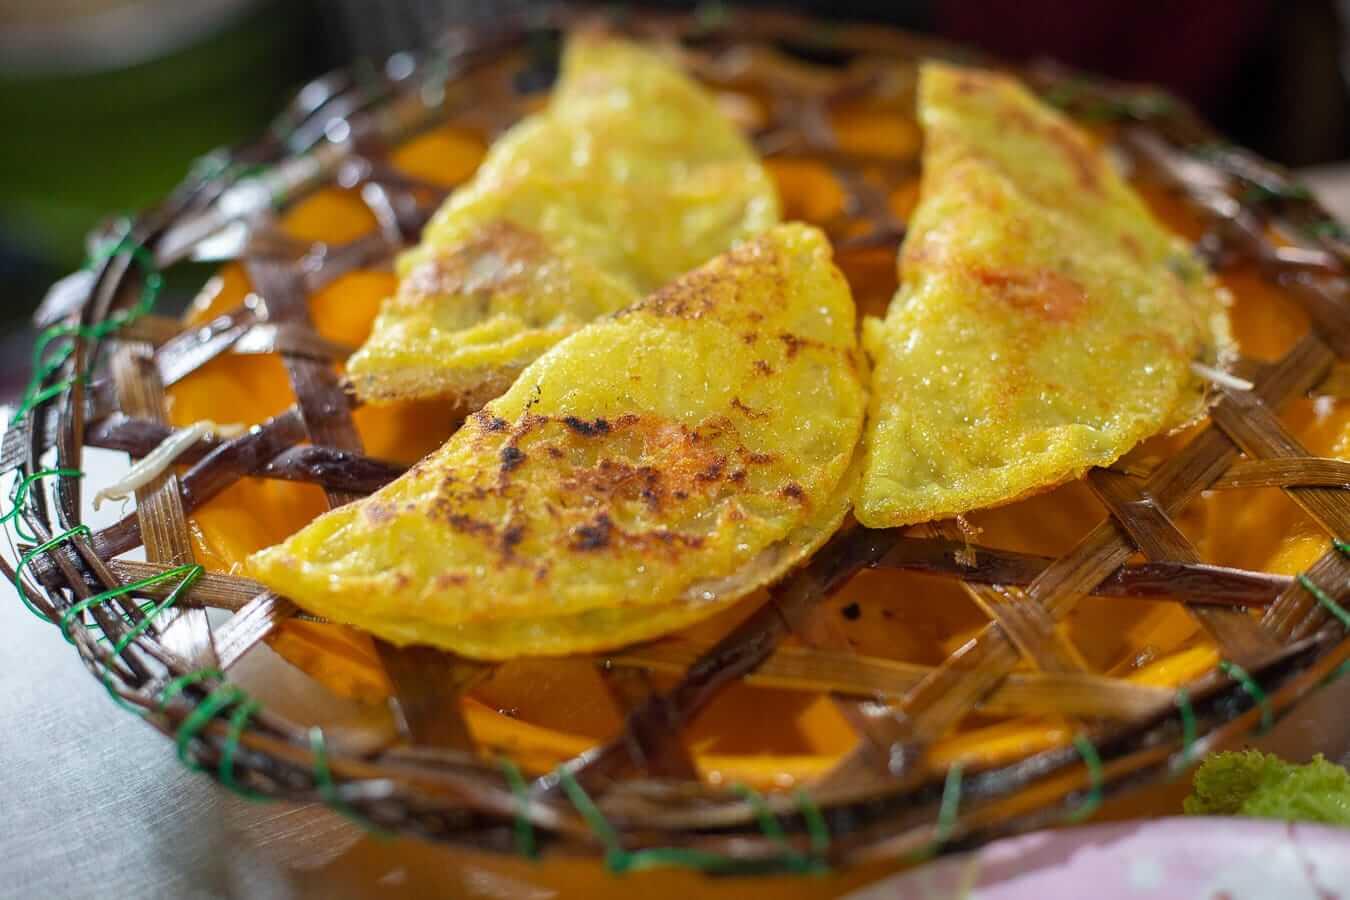 Banh Xeo: Vietnamese food